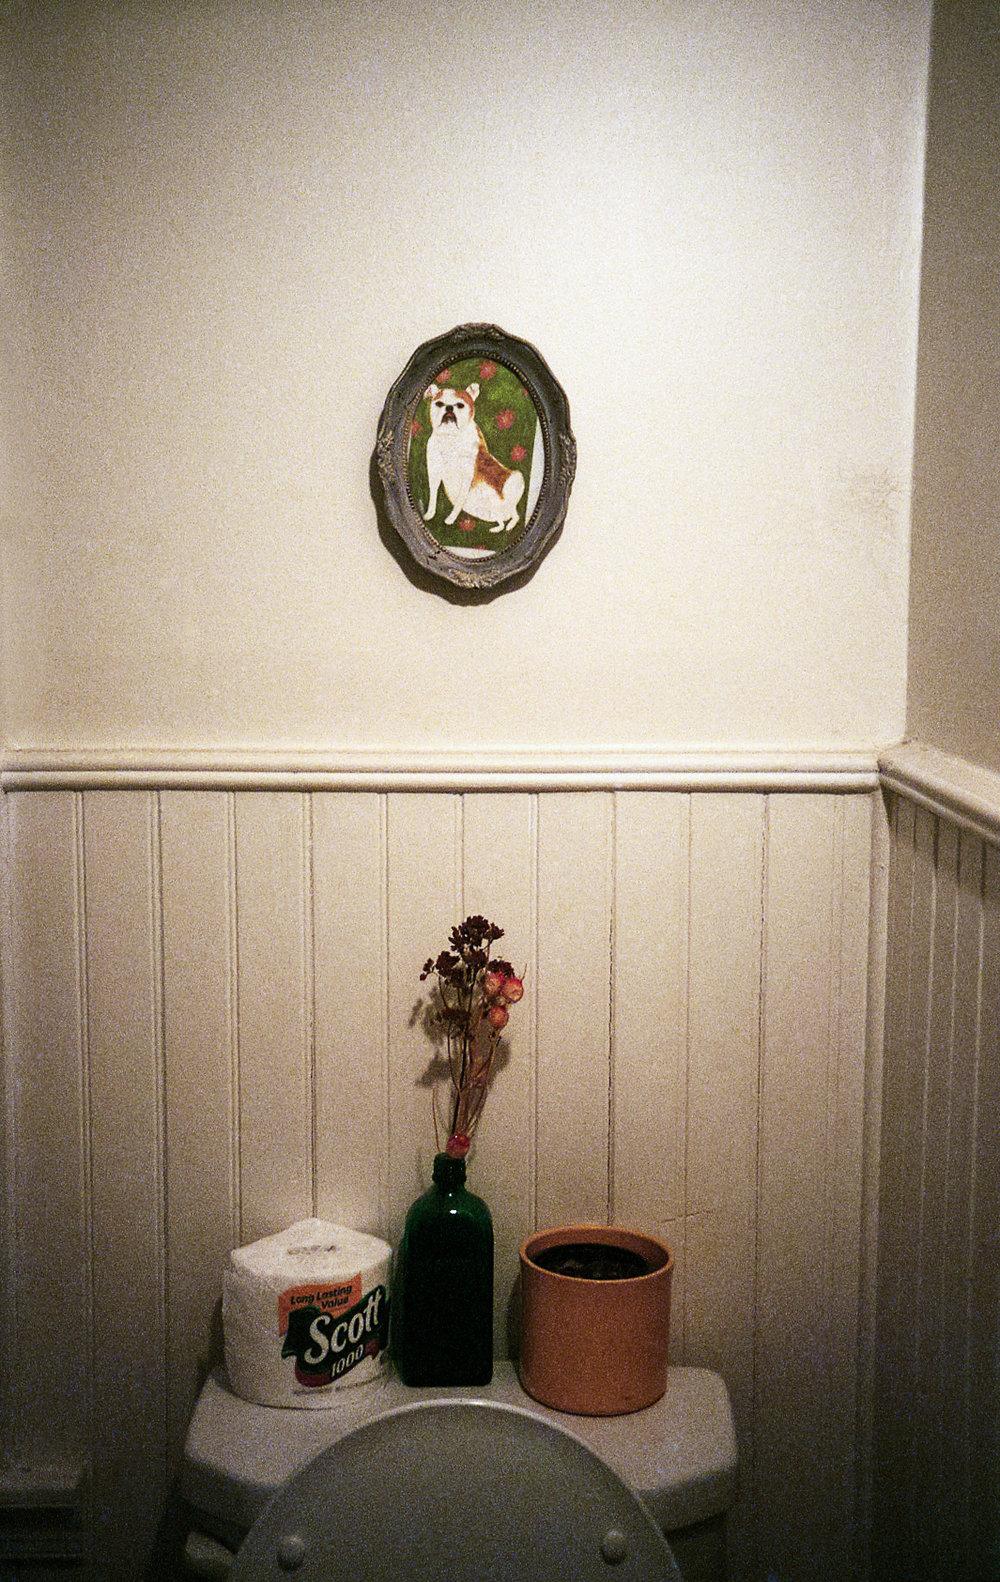 Toilet vignette